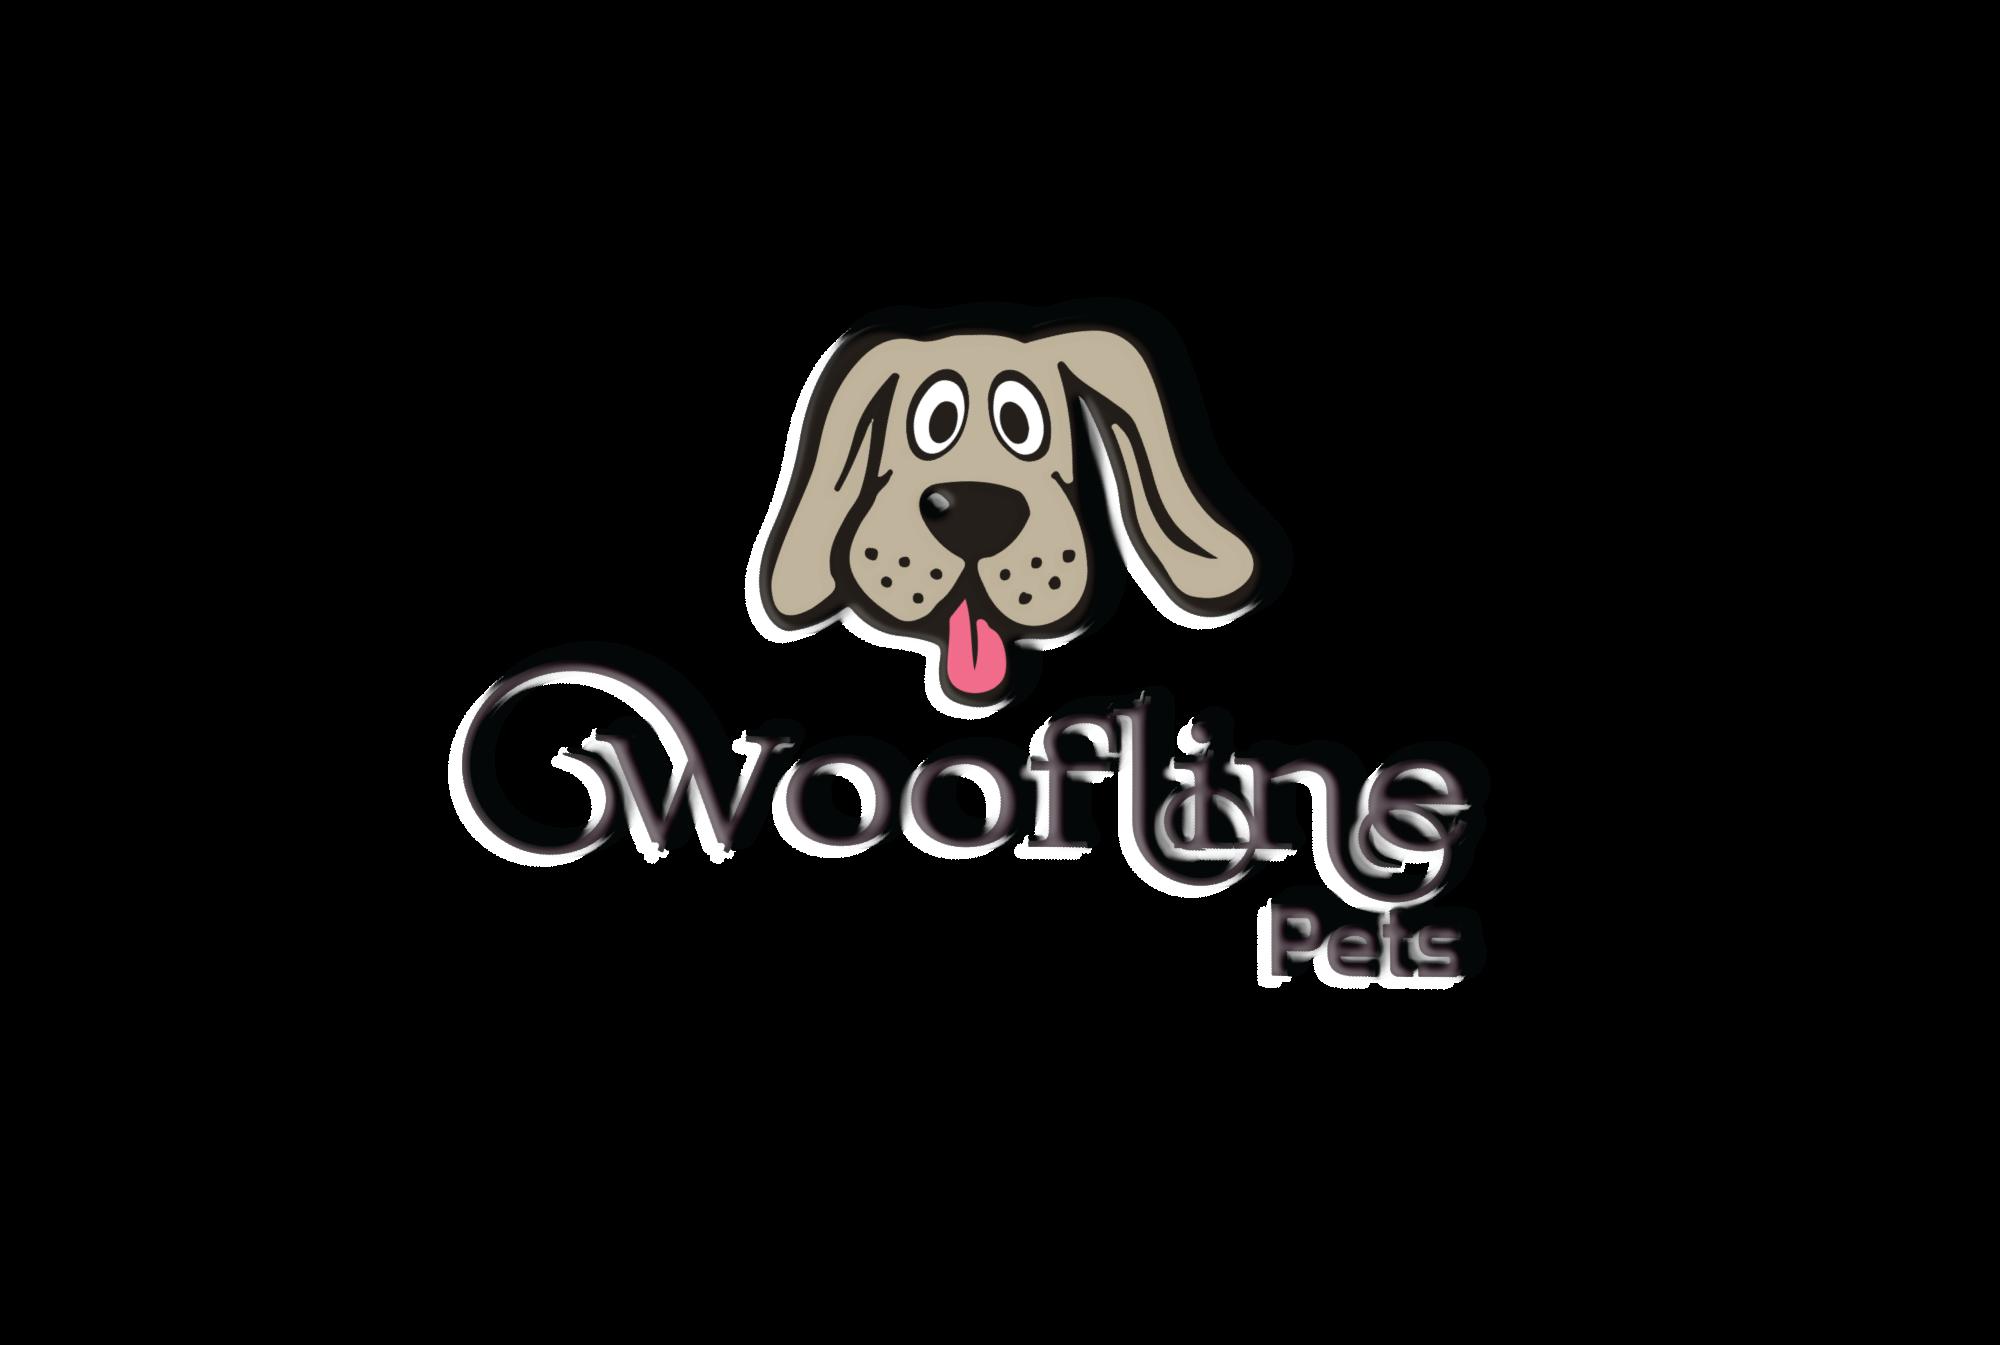 Woofline Pets